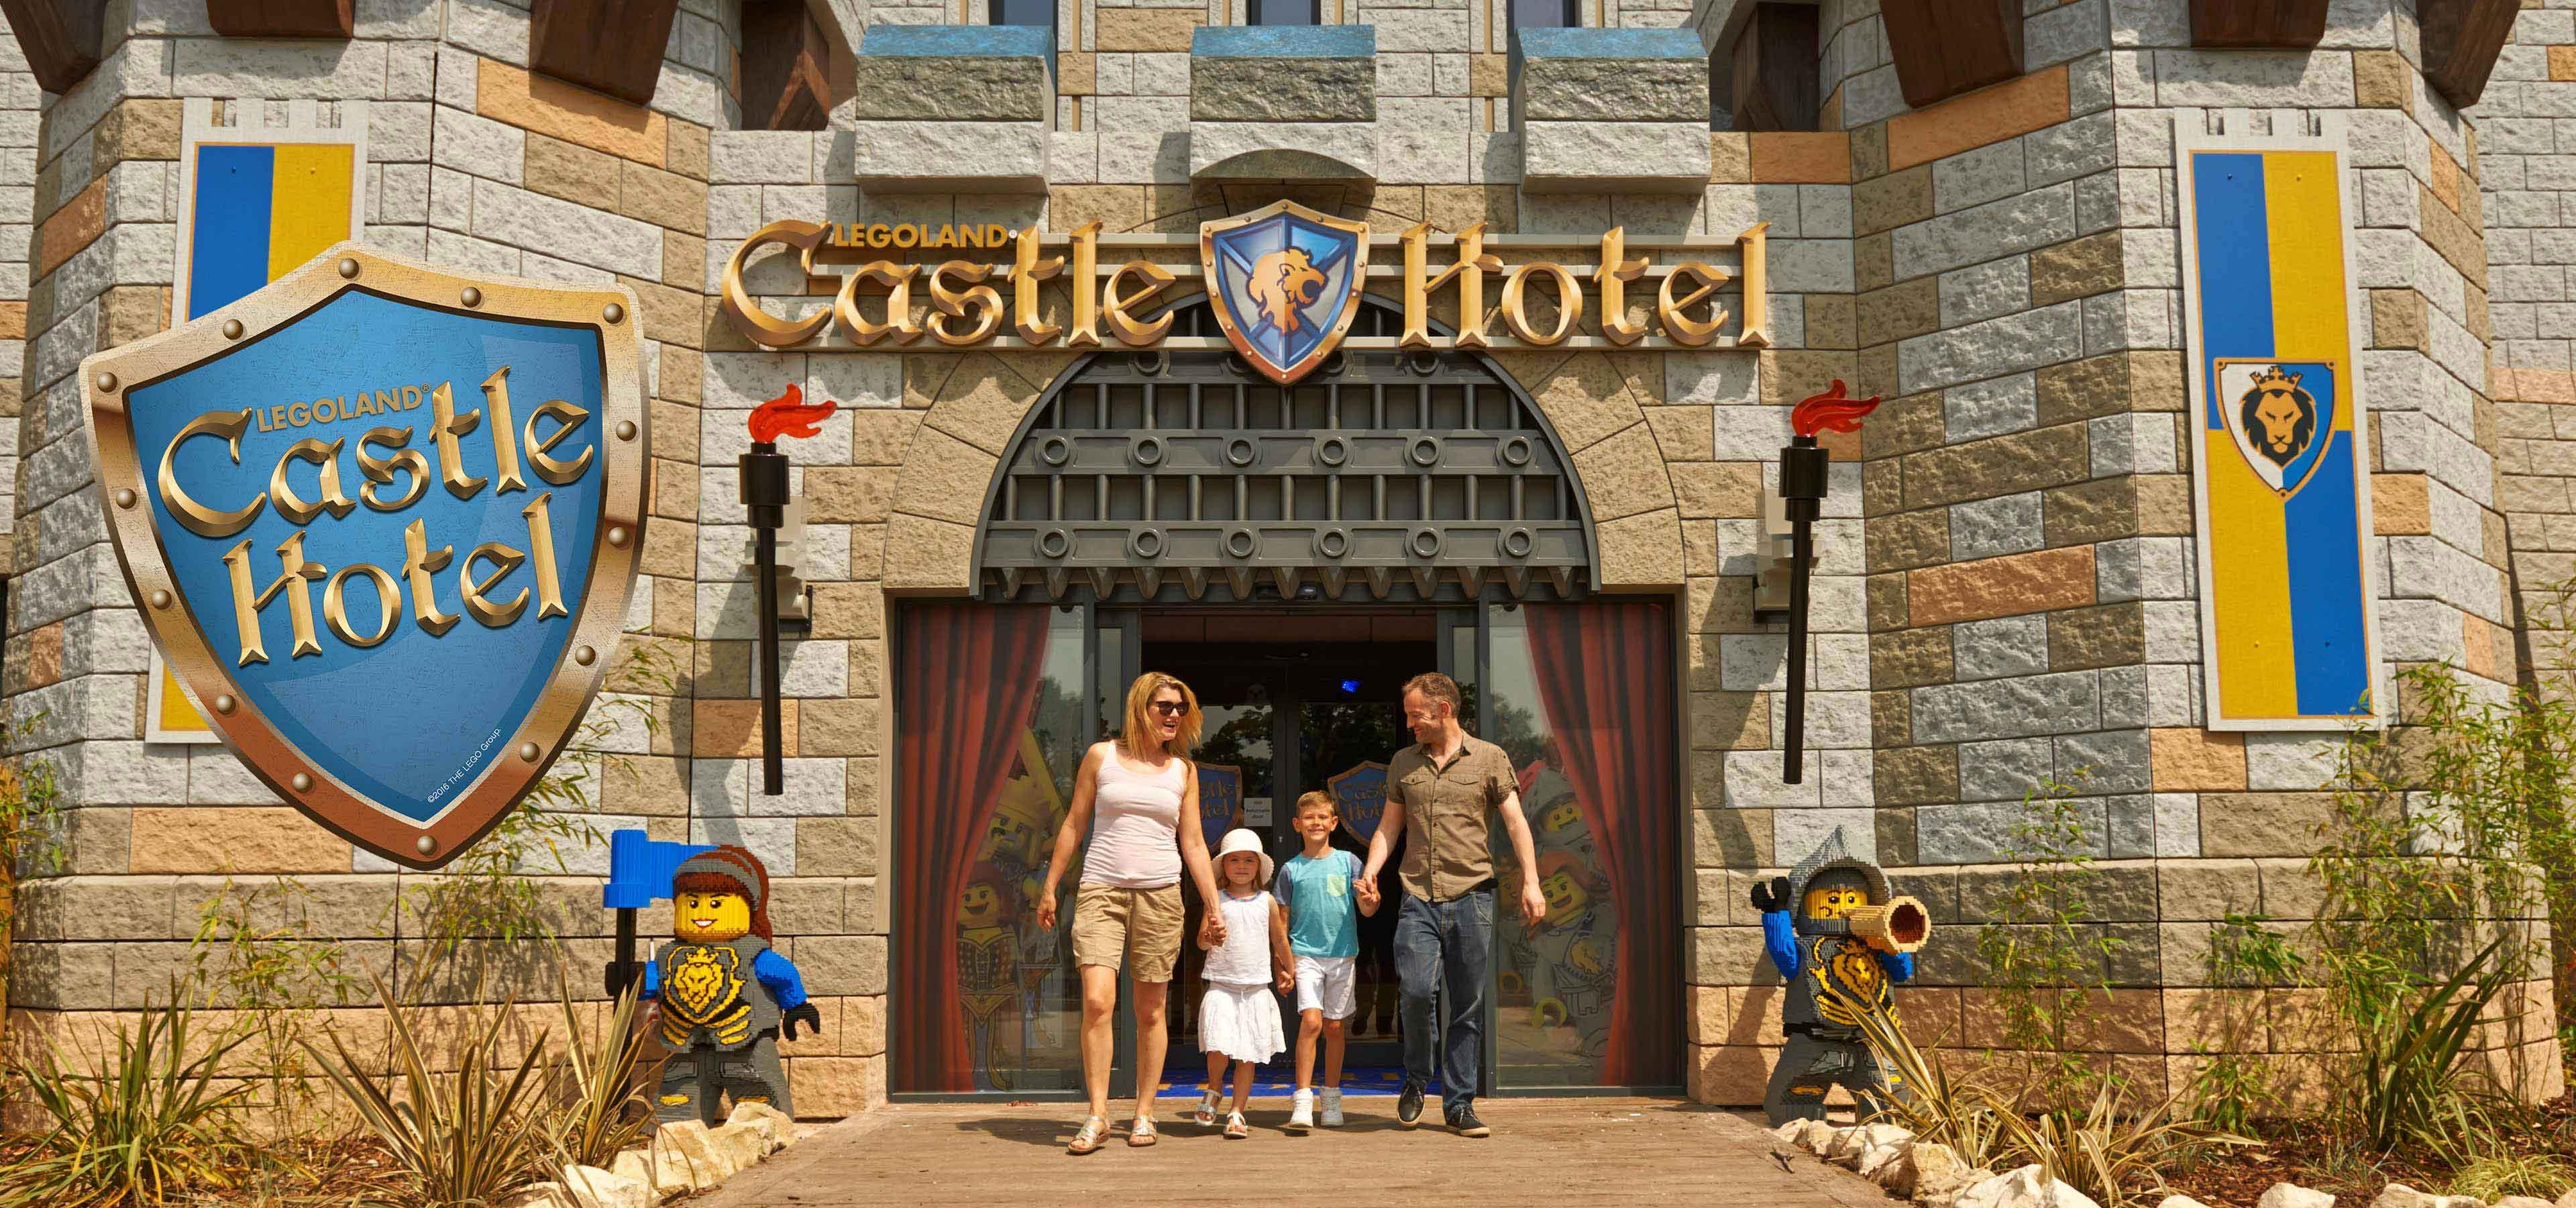 The 6 Best Hotels near Legoland Windsor, Windsor, UK